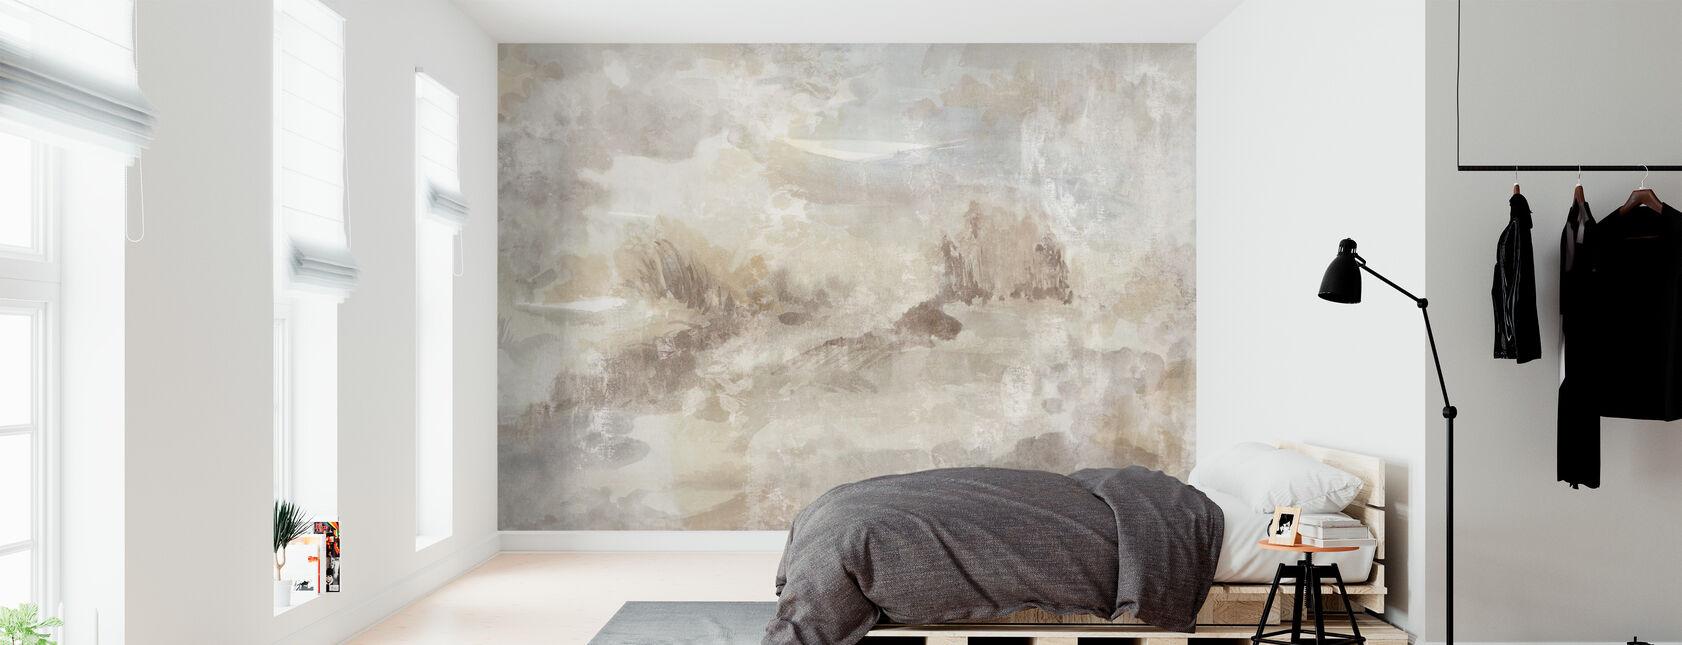 Paisaje de Oeuvre - Papel pintado - Dormitorio